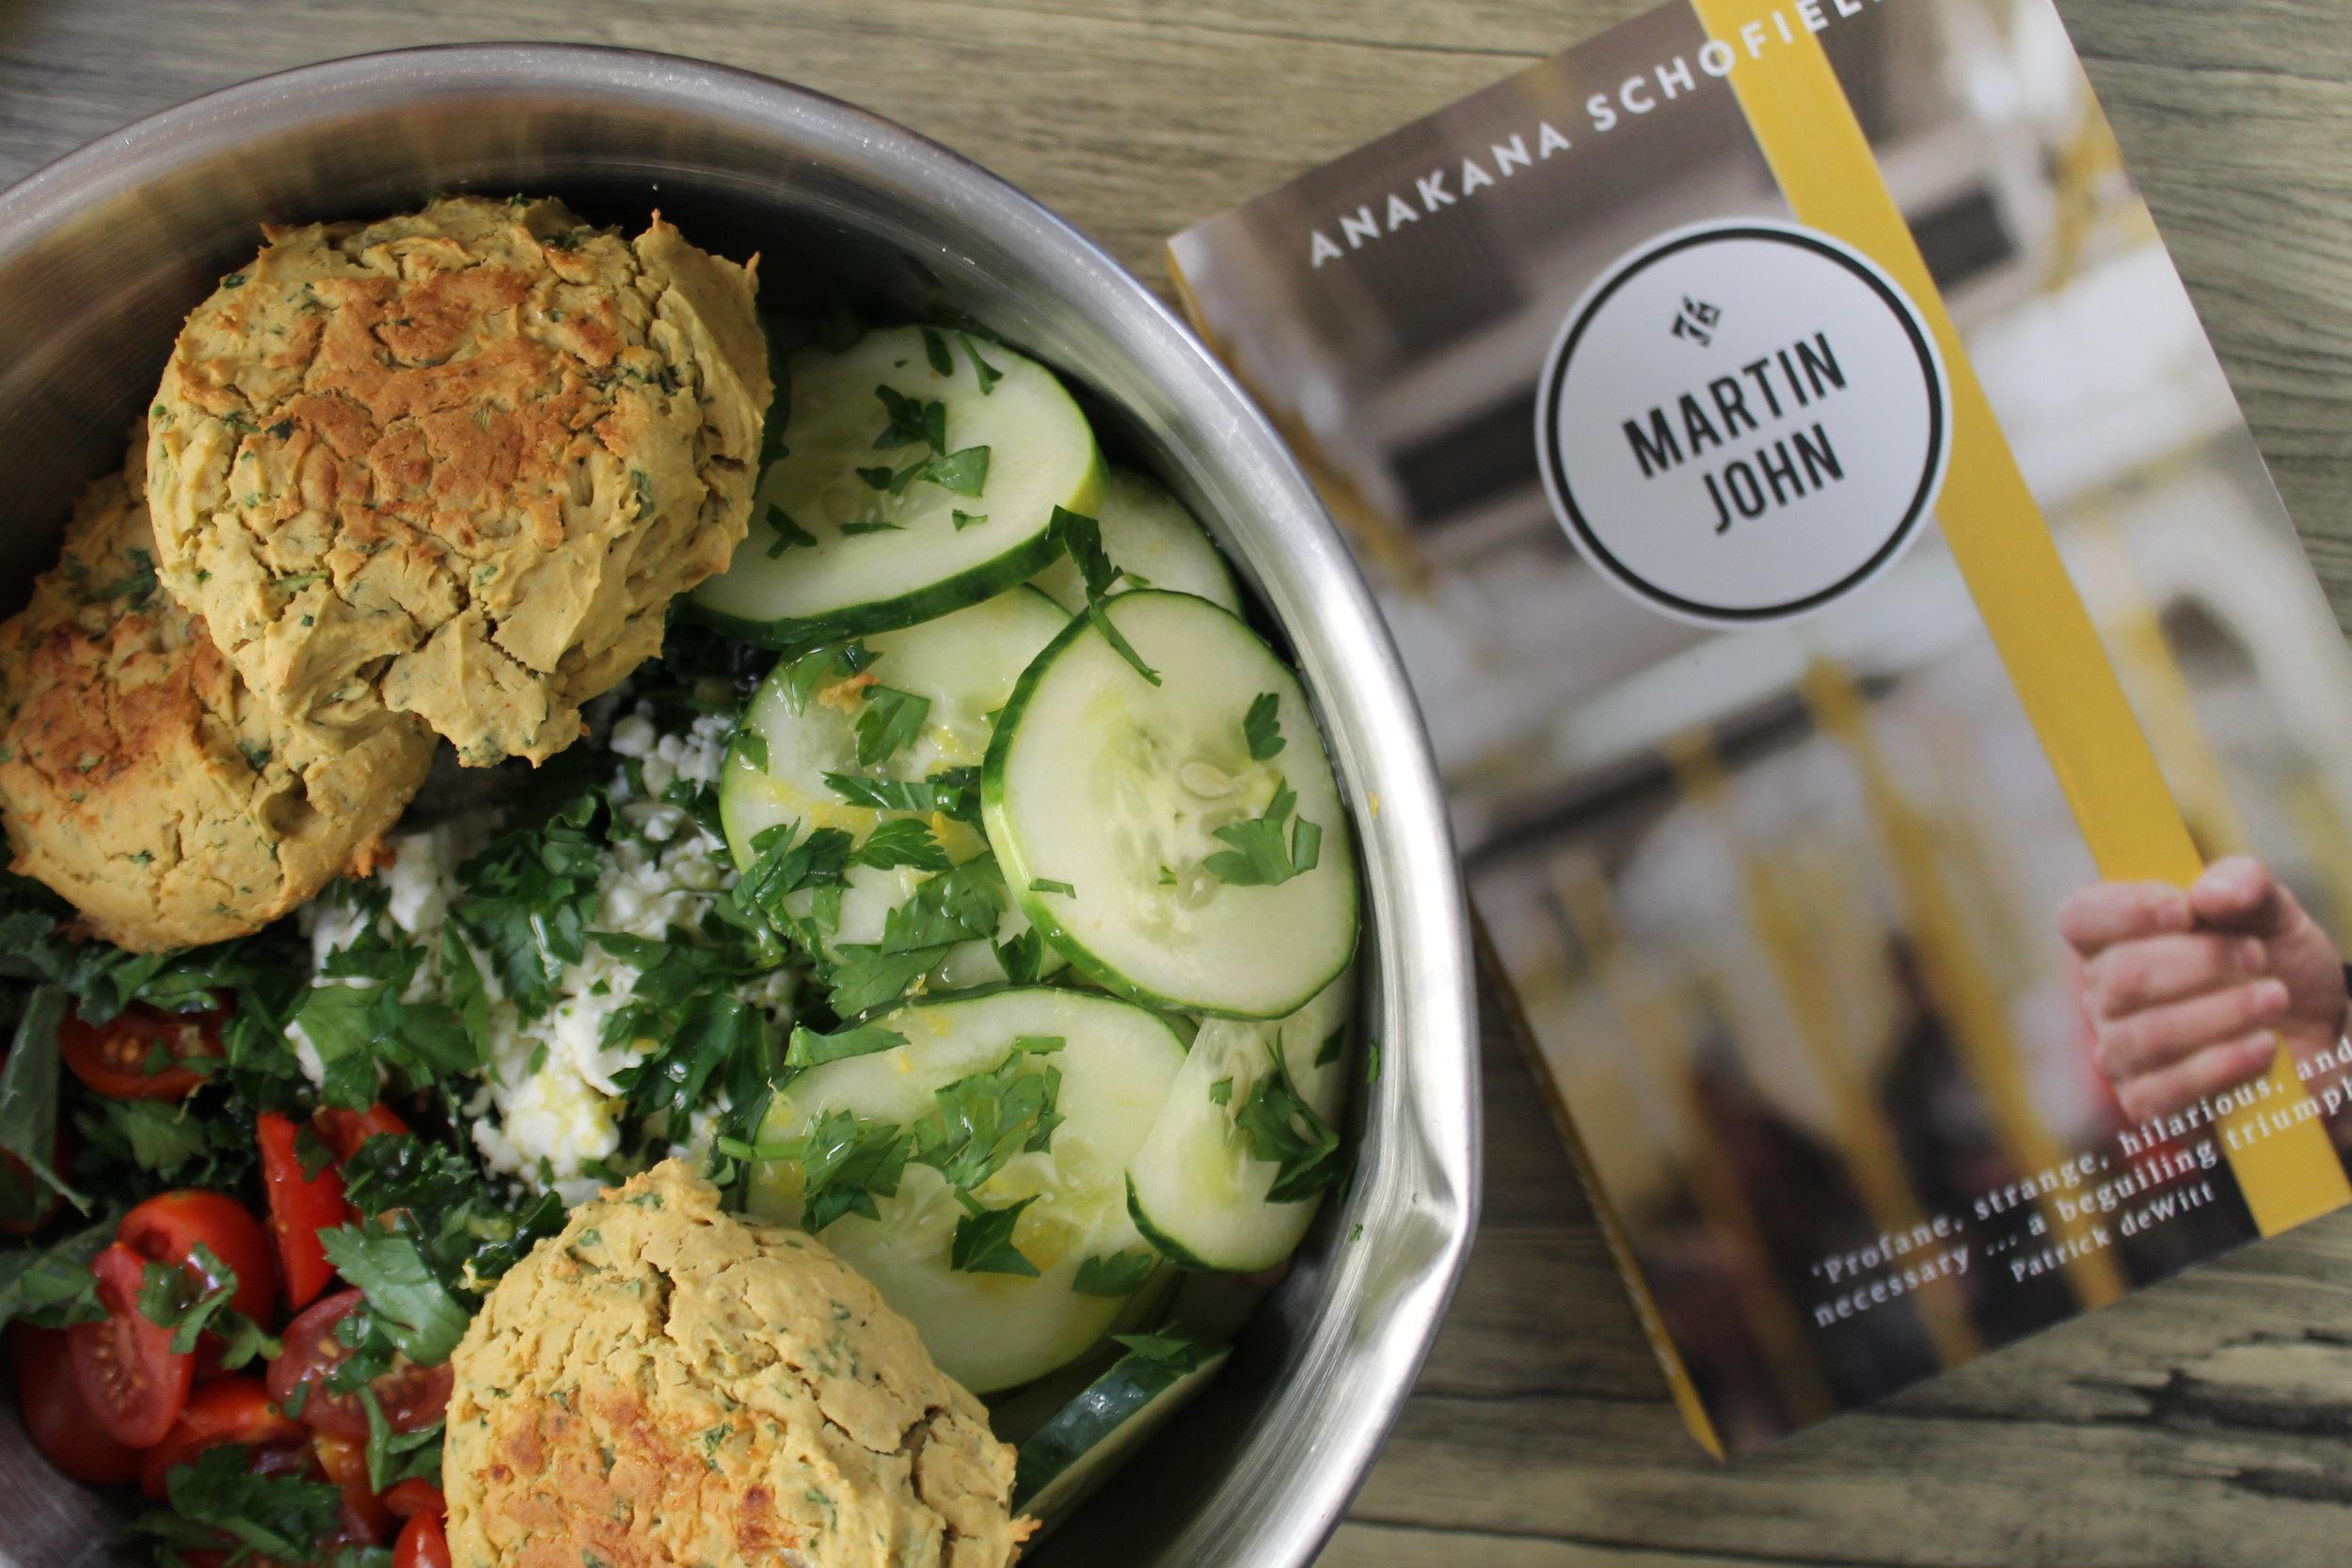 Baked Falafel Salad and Martin John